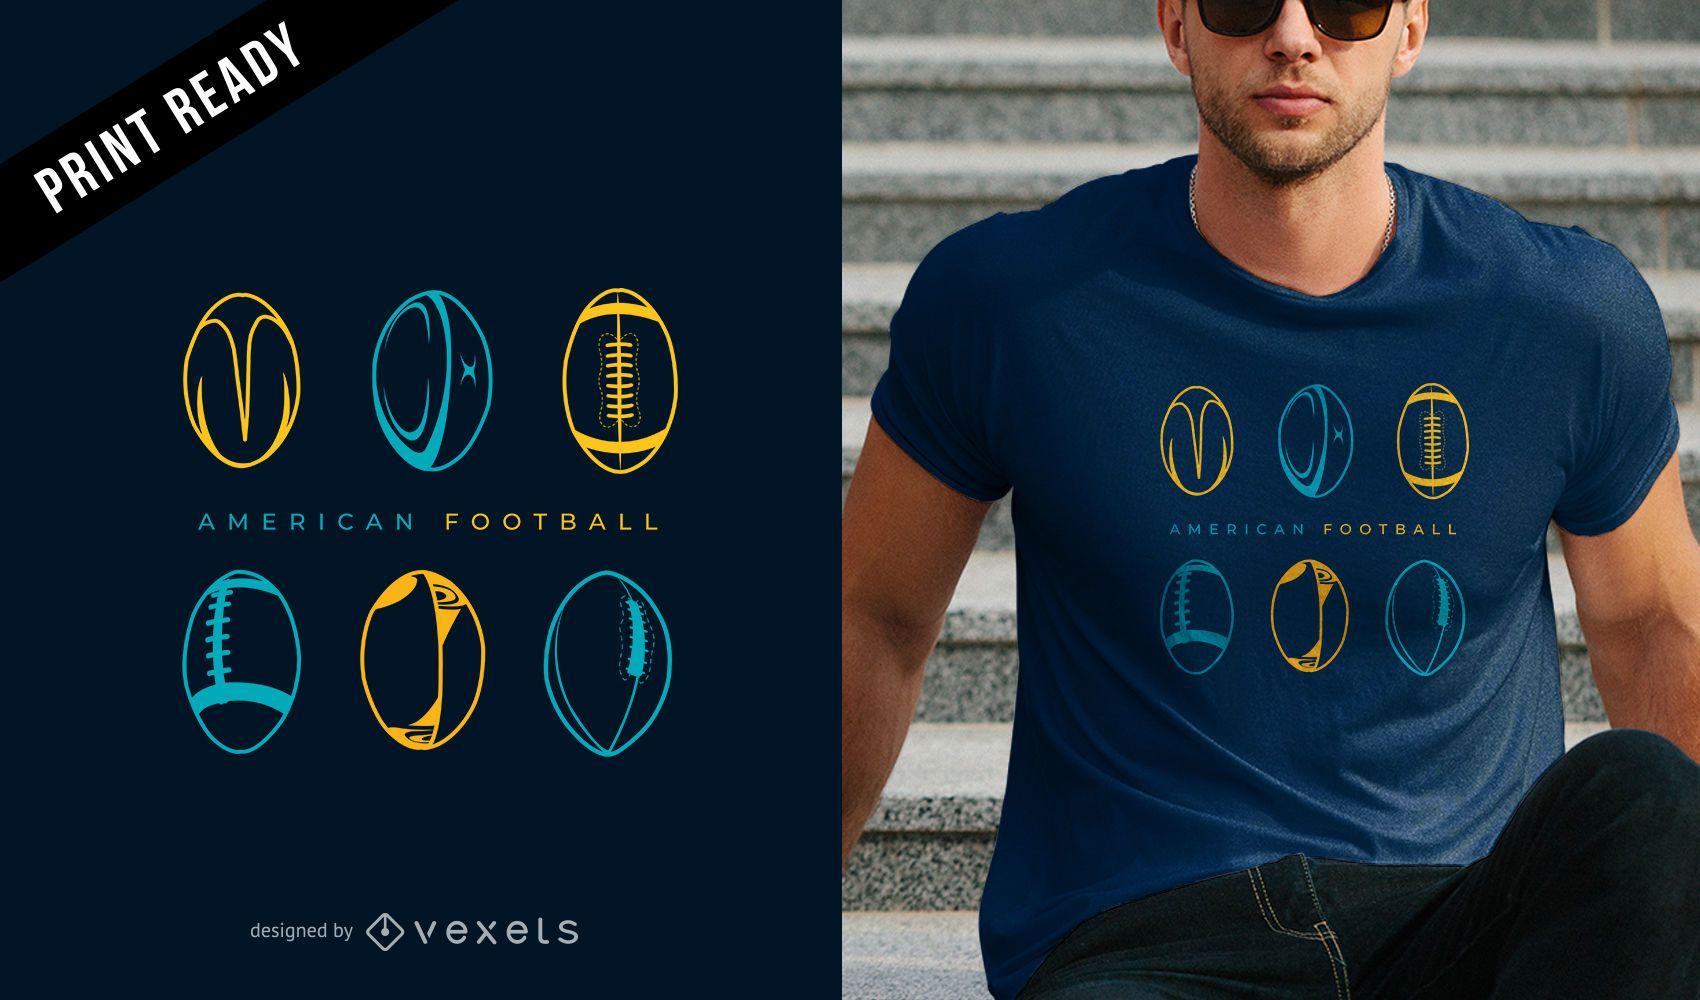 American football t-shirt design